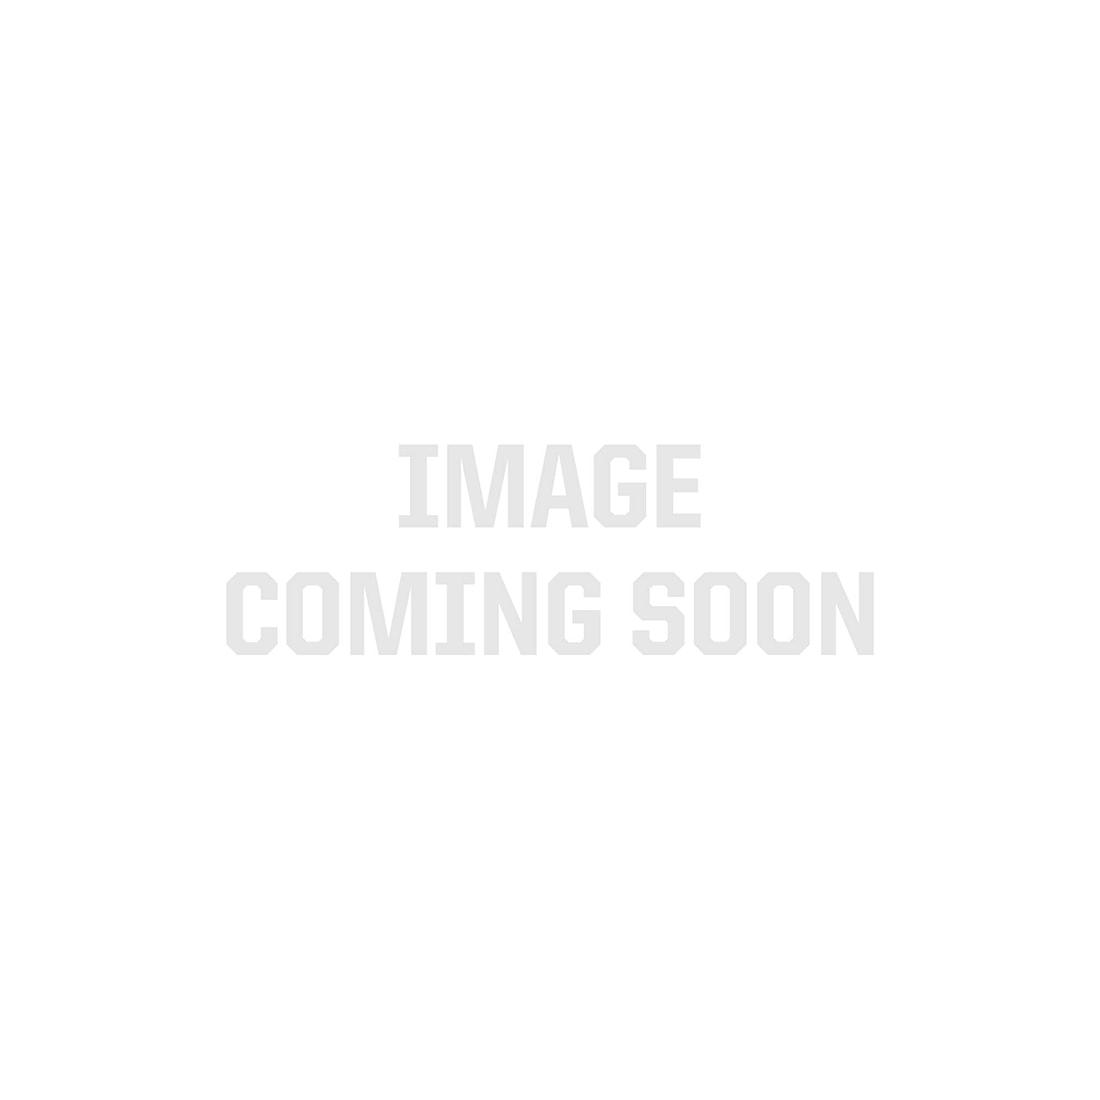 MaxLite MaxLED full cutoff LED Wall Pack (Dark Sky), 35 Watts Bronze or White